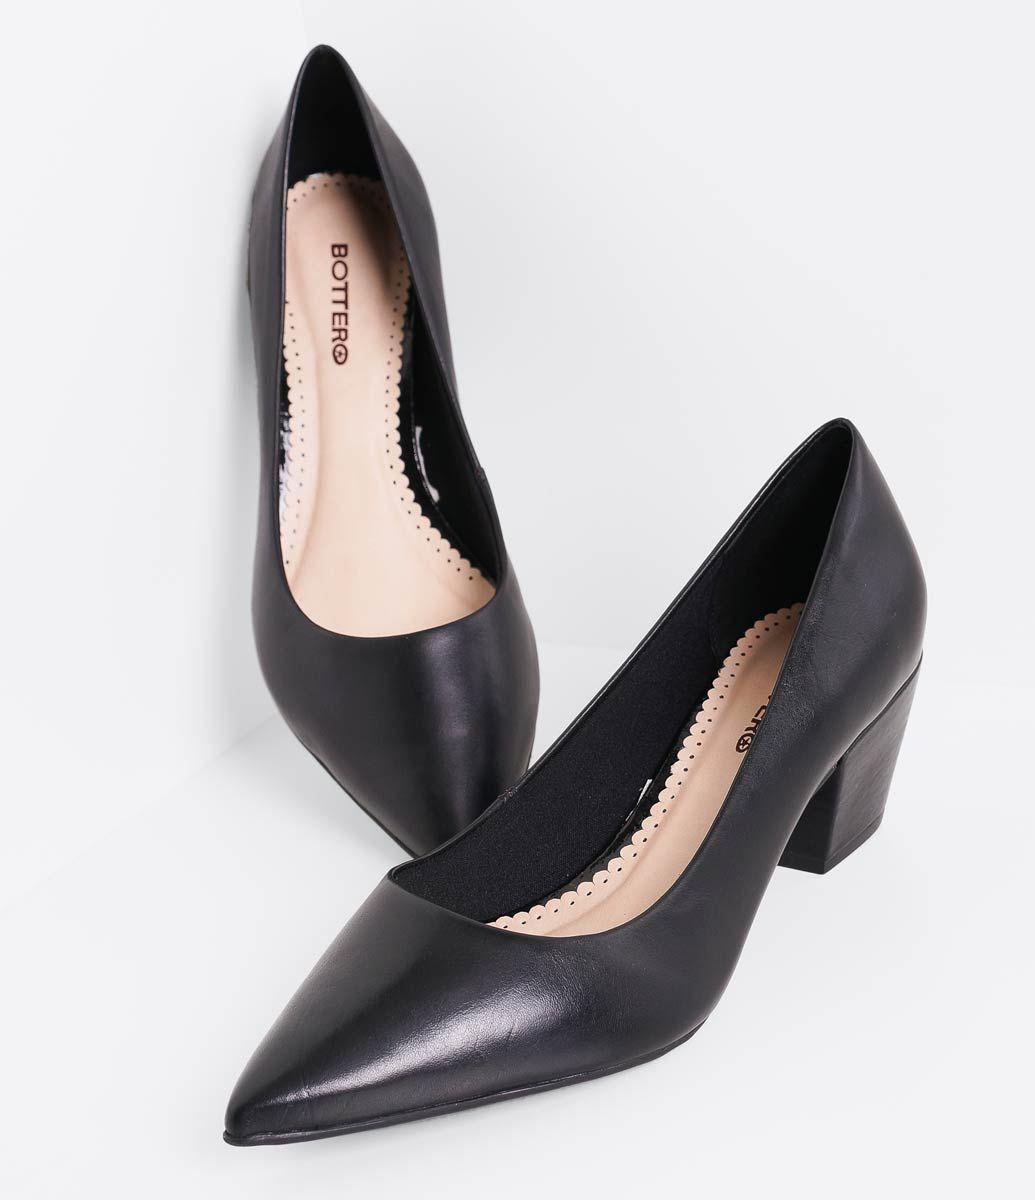 bcb3b5aec Sapato Scarpin Feminino Bottero | Shoes | Scarpin feminino, Sapato ...